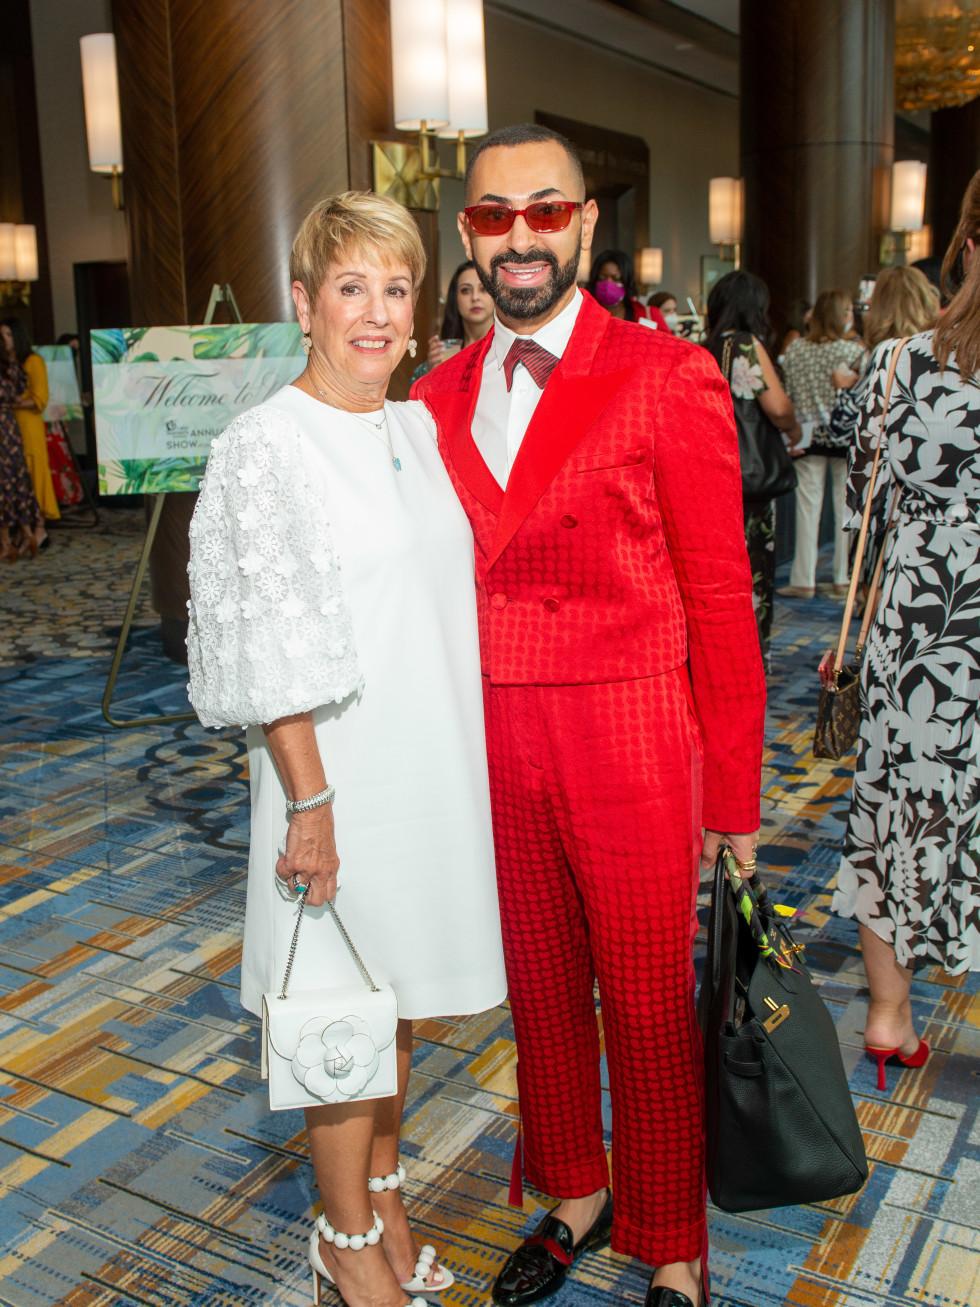 LWI Houston 2021 fashion show luncheon Donna Lewis Fady Armanious